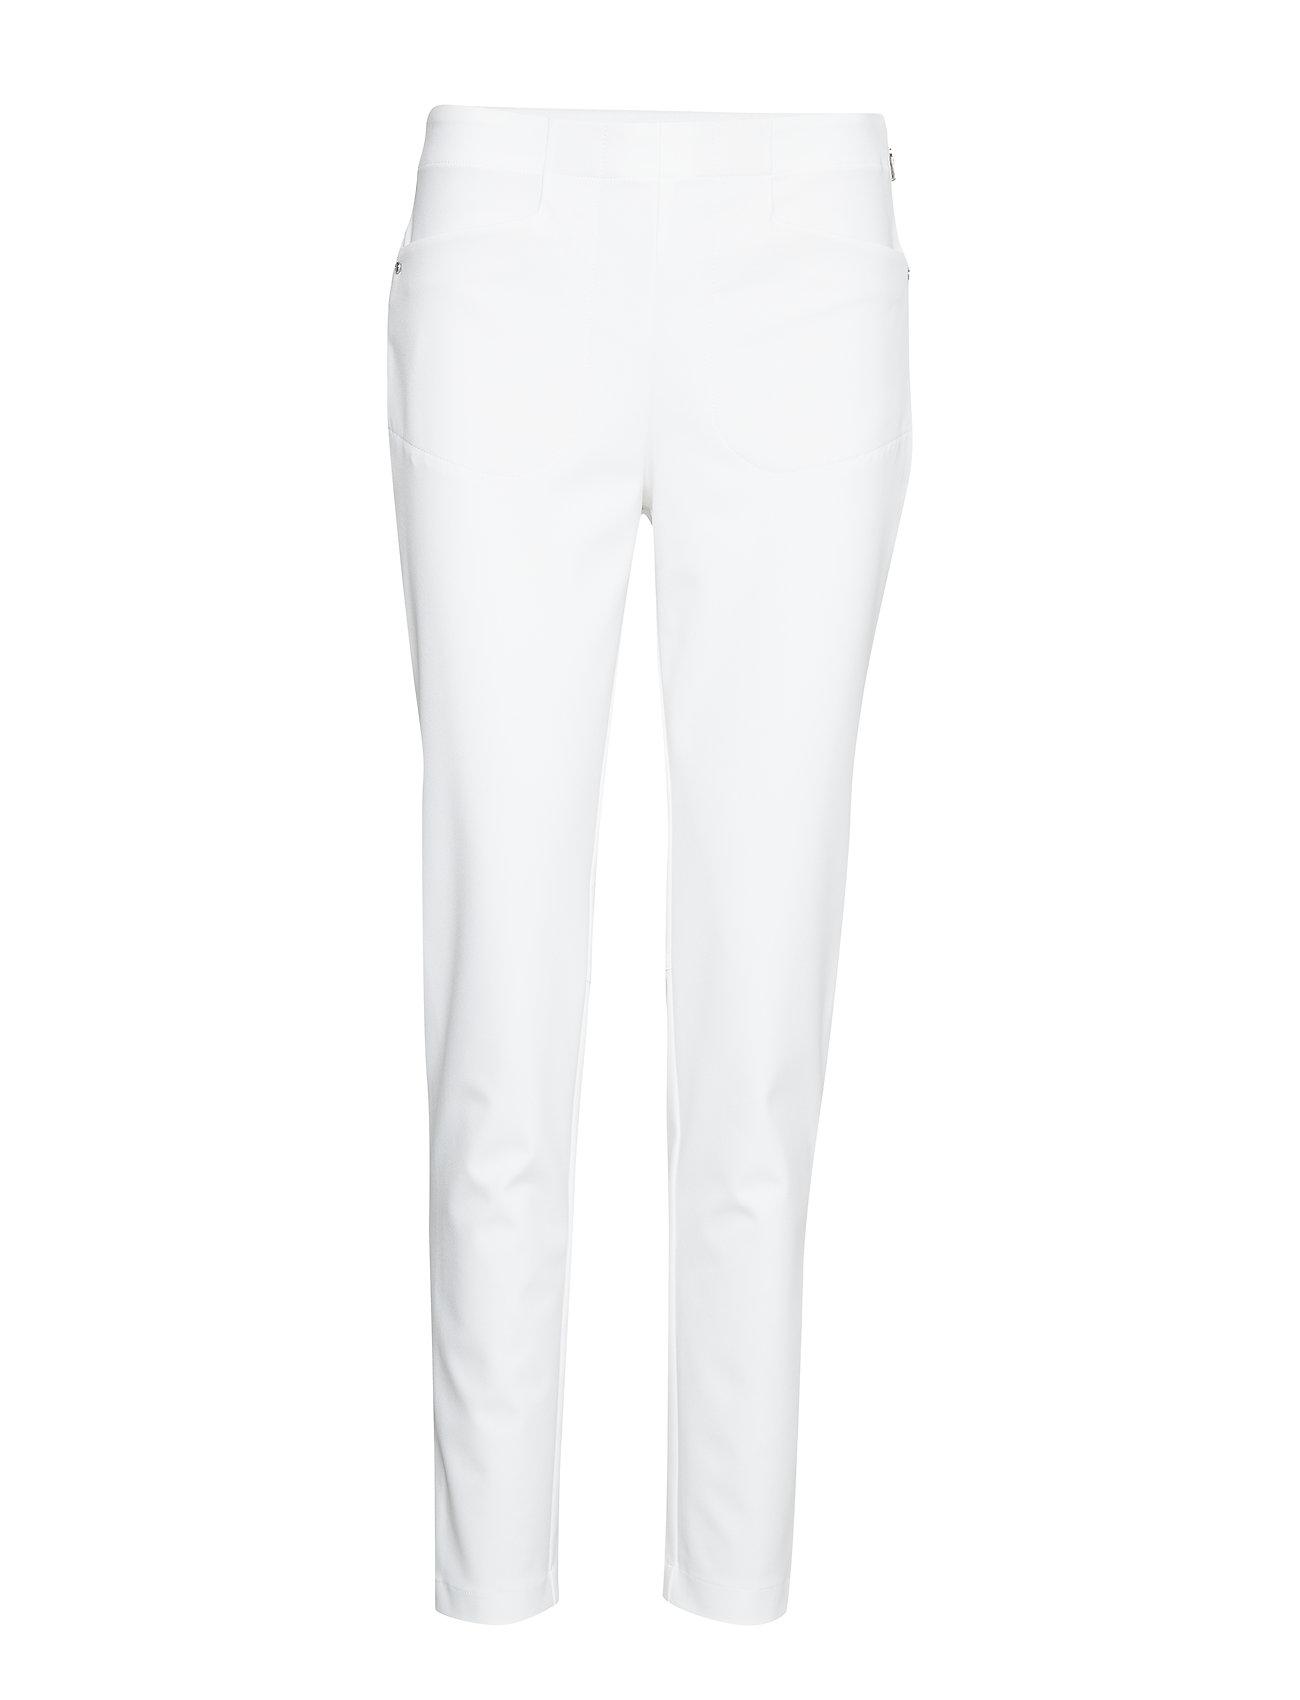 Ralph Lauren Golf Stretch Athletic Golf Pant - PURE WHITE